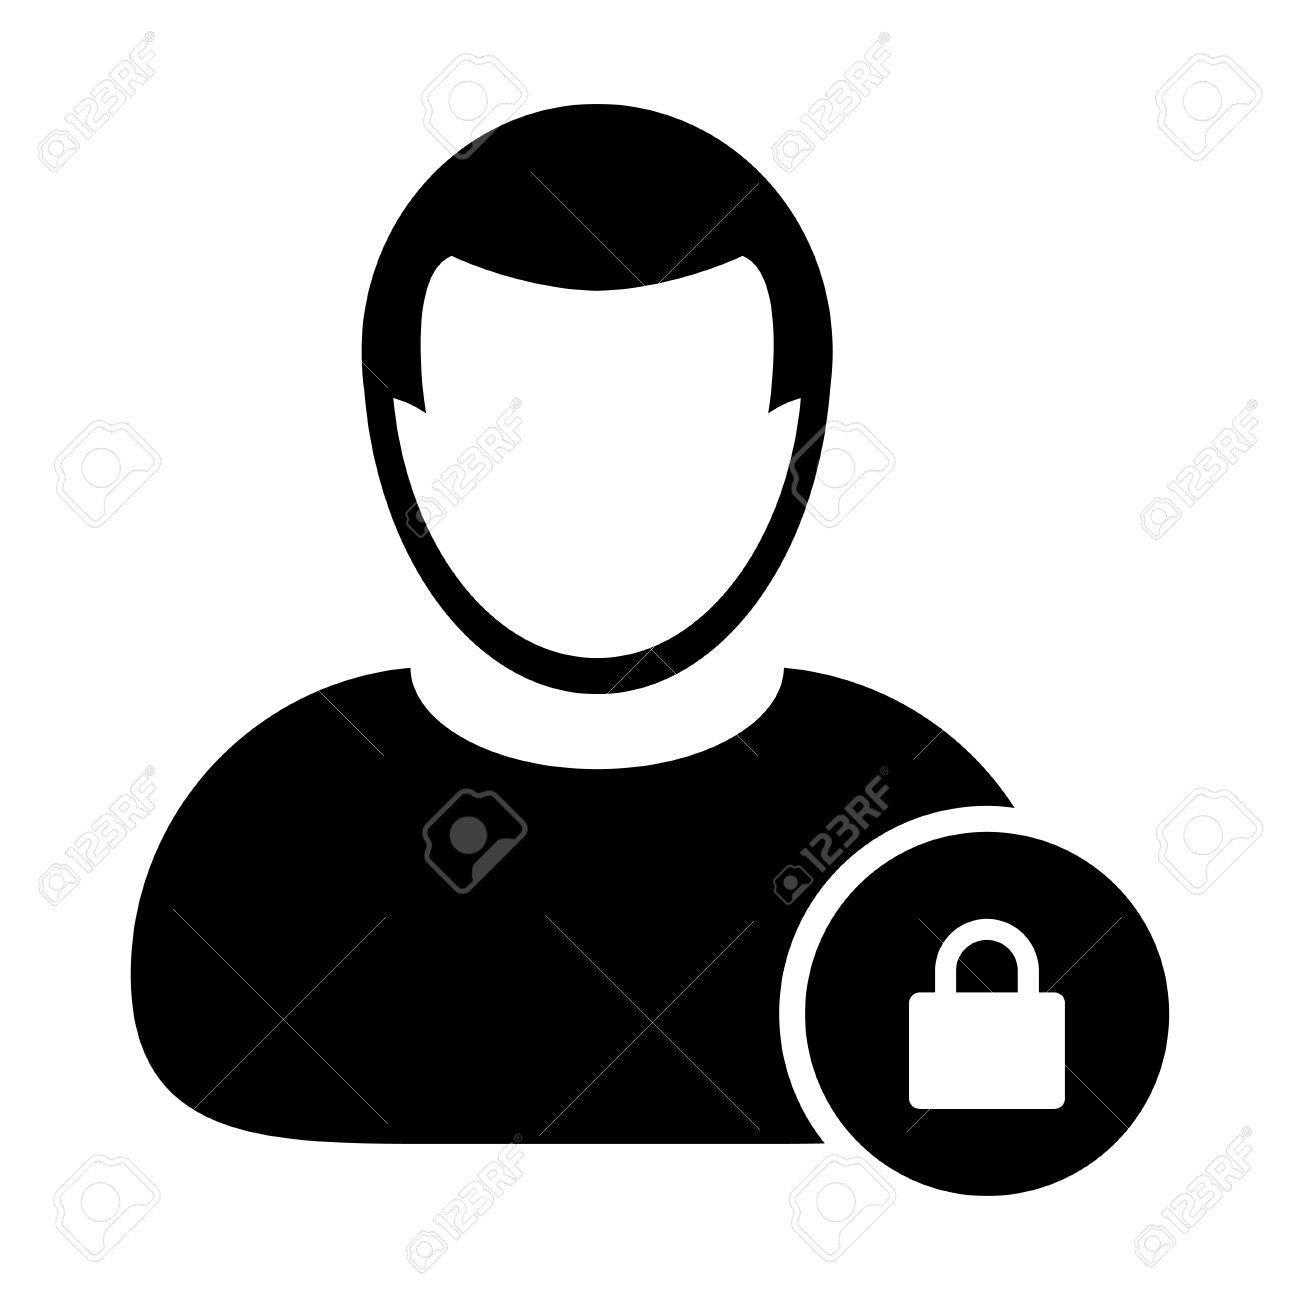 123Rf Password user icon - lock, security, password, login user icon in (glyph